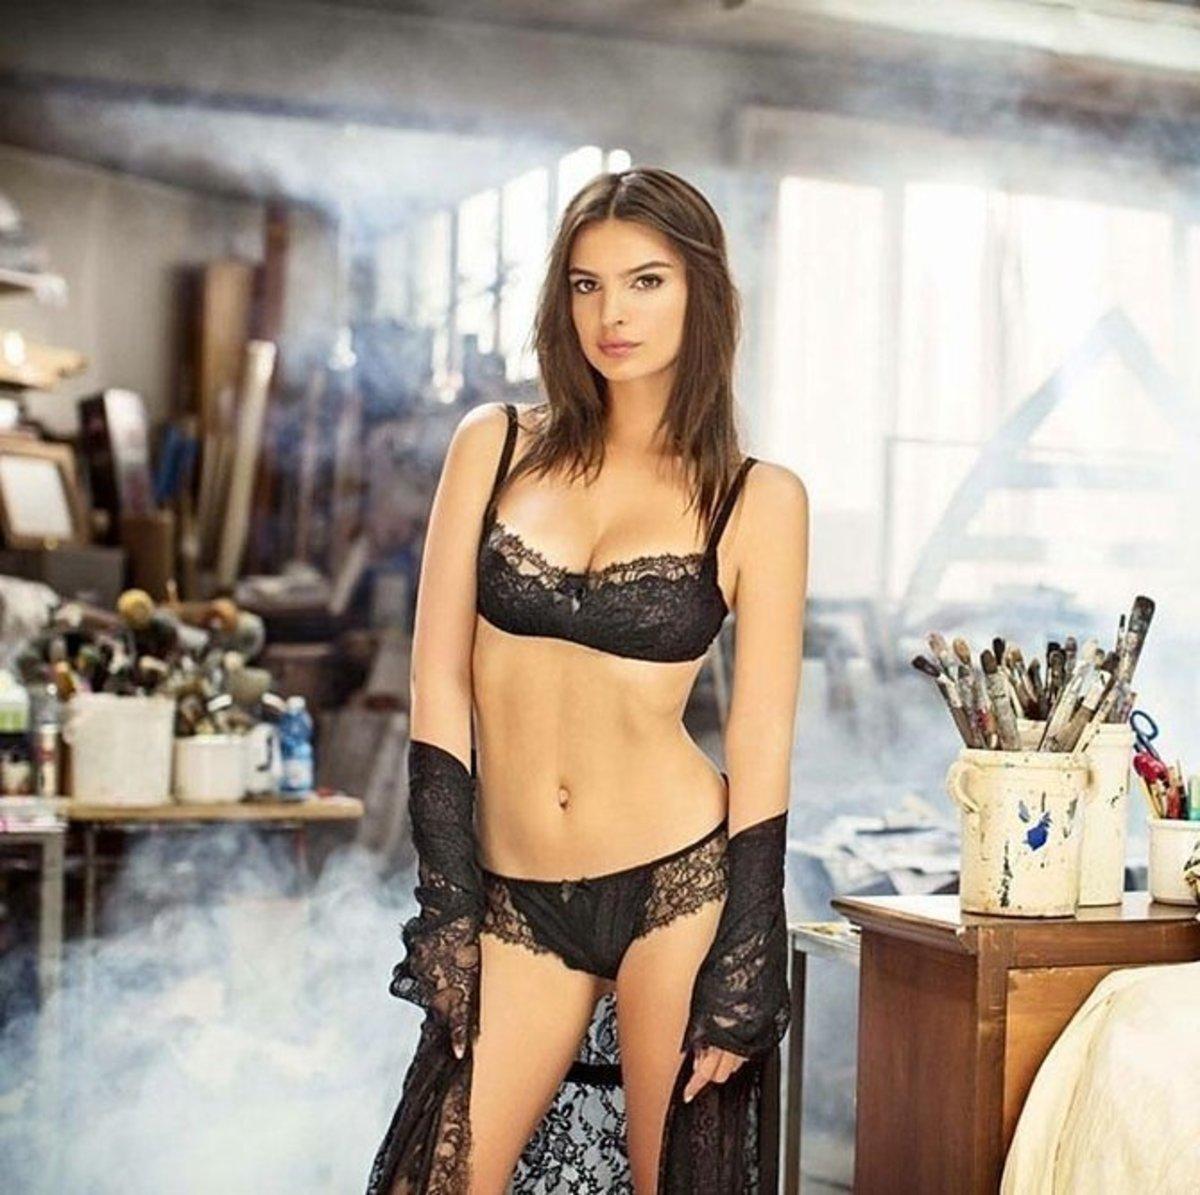 emily-ratajkowski-yamamay-underwear-2014-fall-ad-campaign16